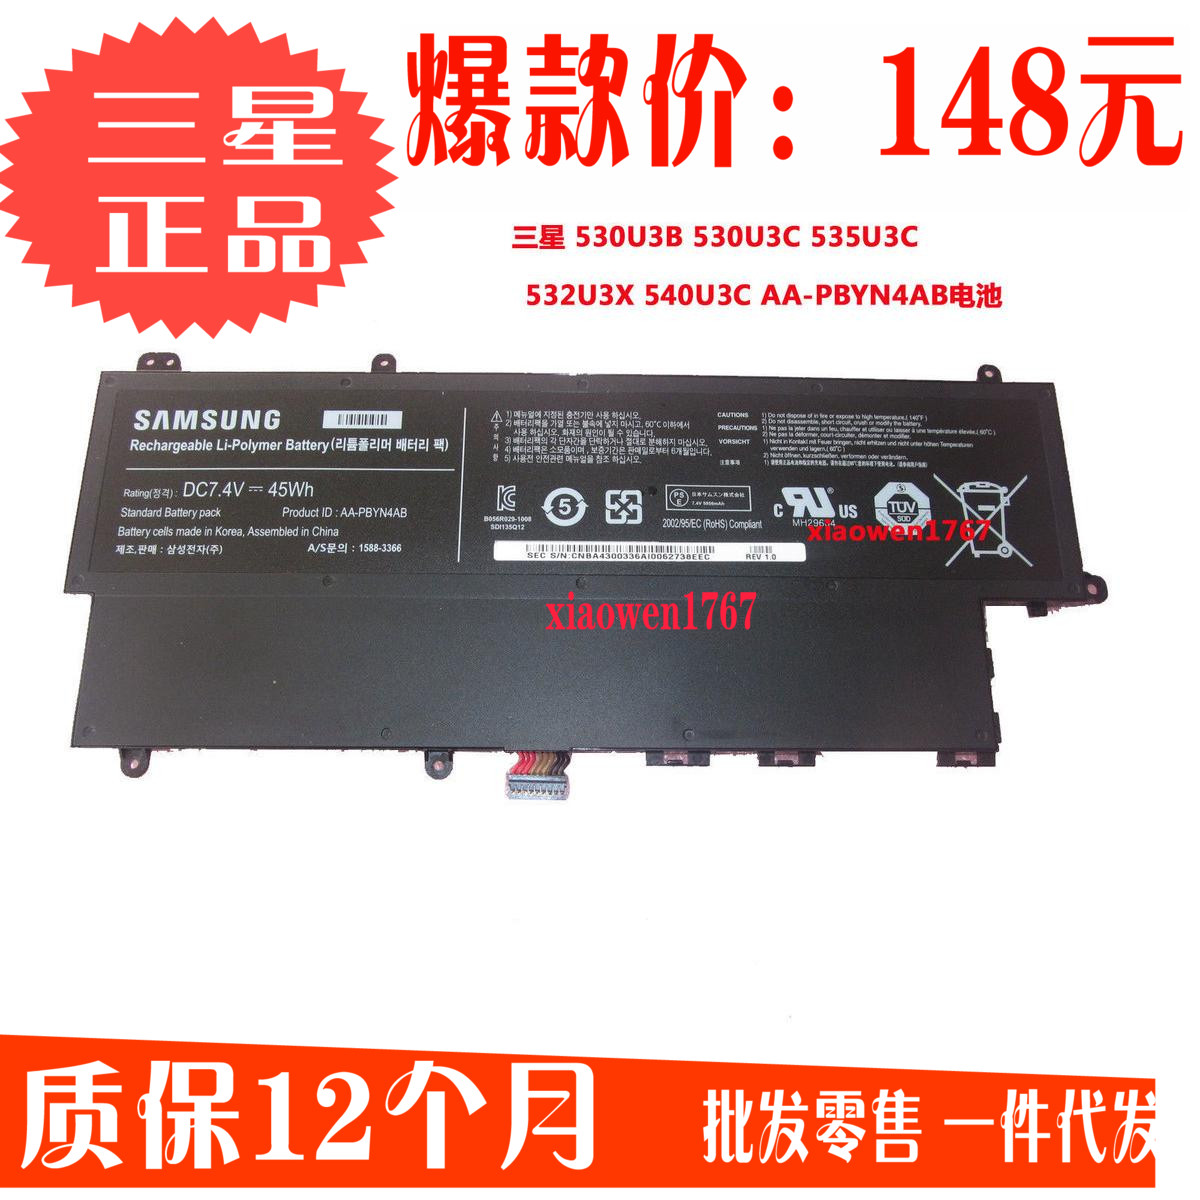 全新三星 530U3B 530U3C 535U3C 532U3X 540U3C AA-PBYN4AB电池